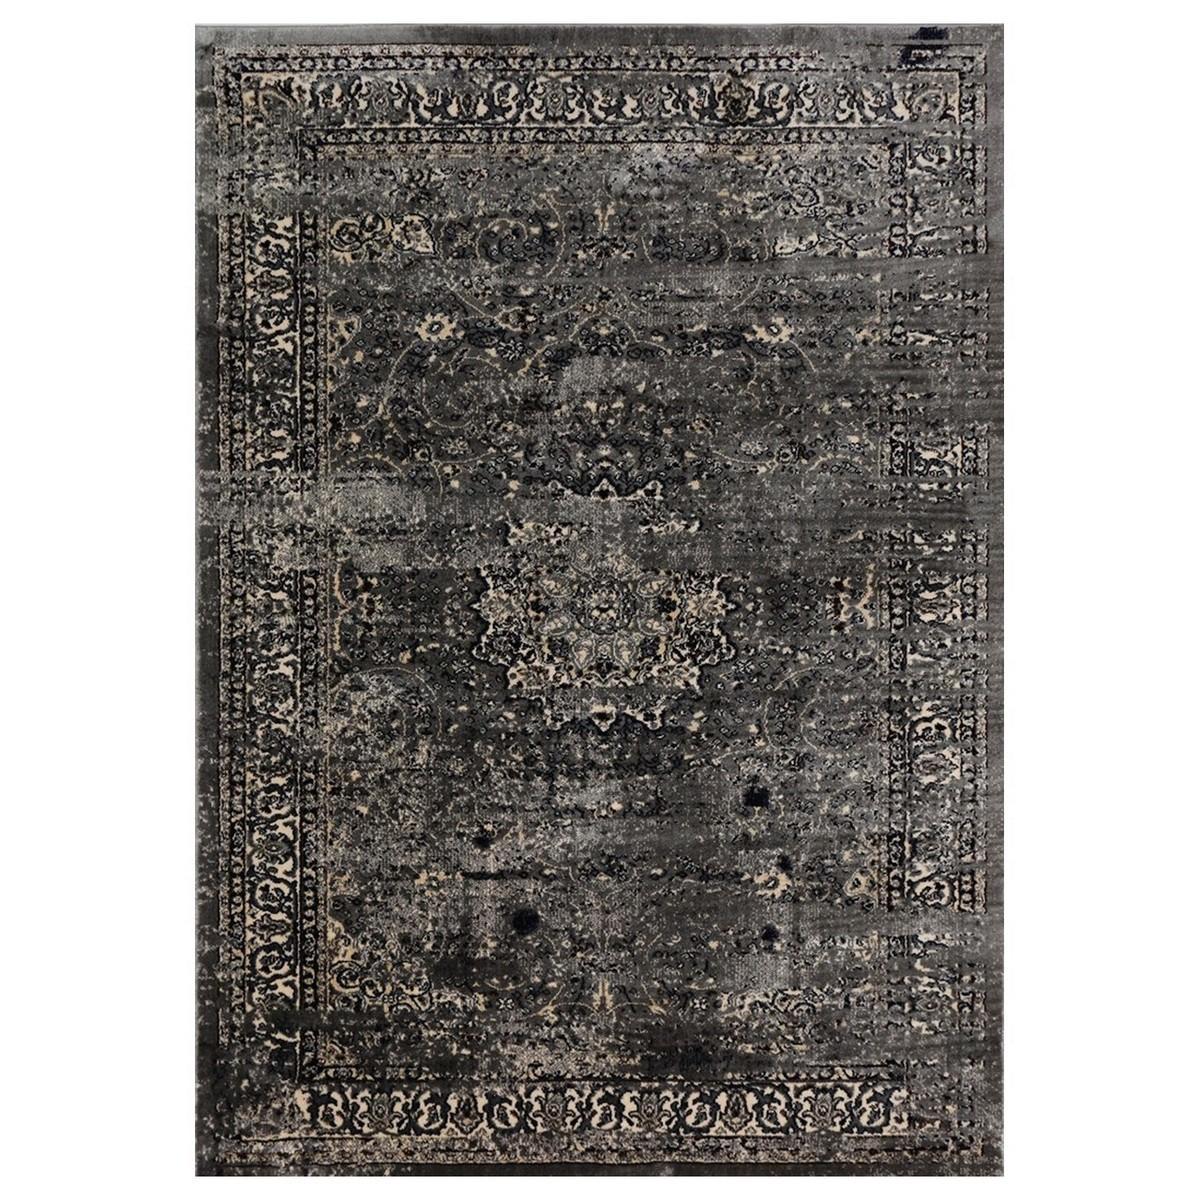 Artifact Parisa Distressed Oriental Rug, 80x150cm